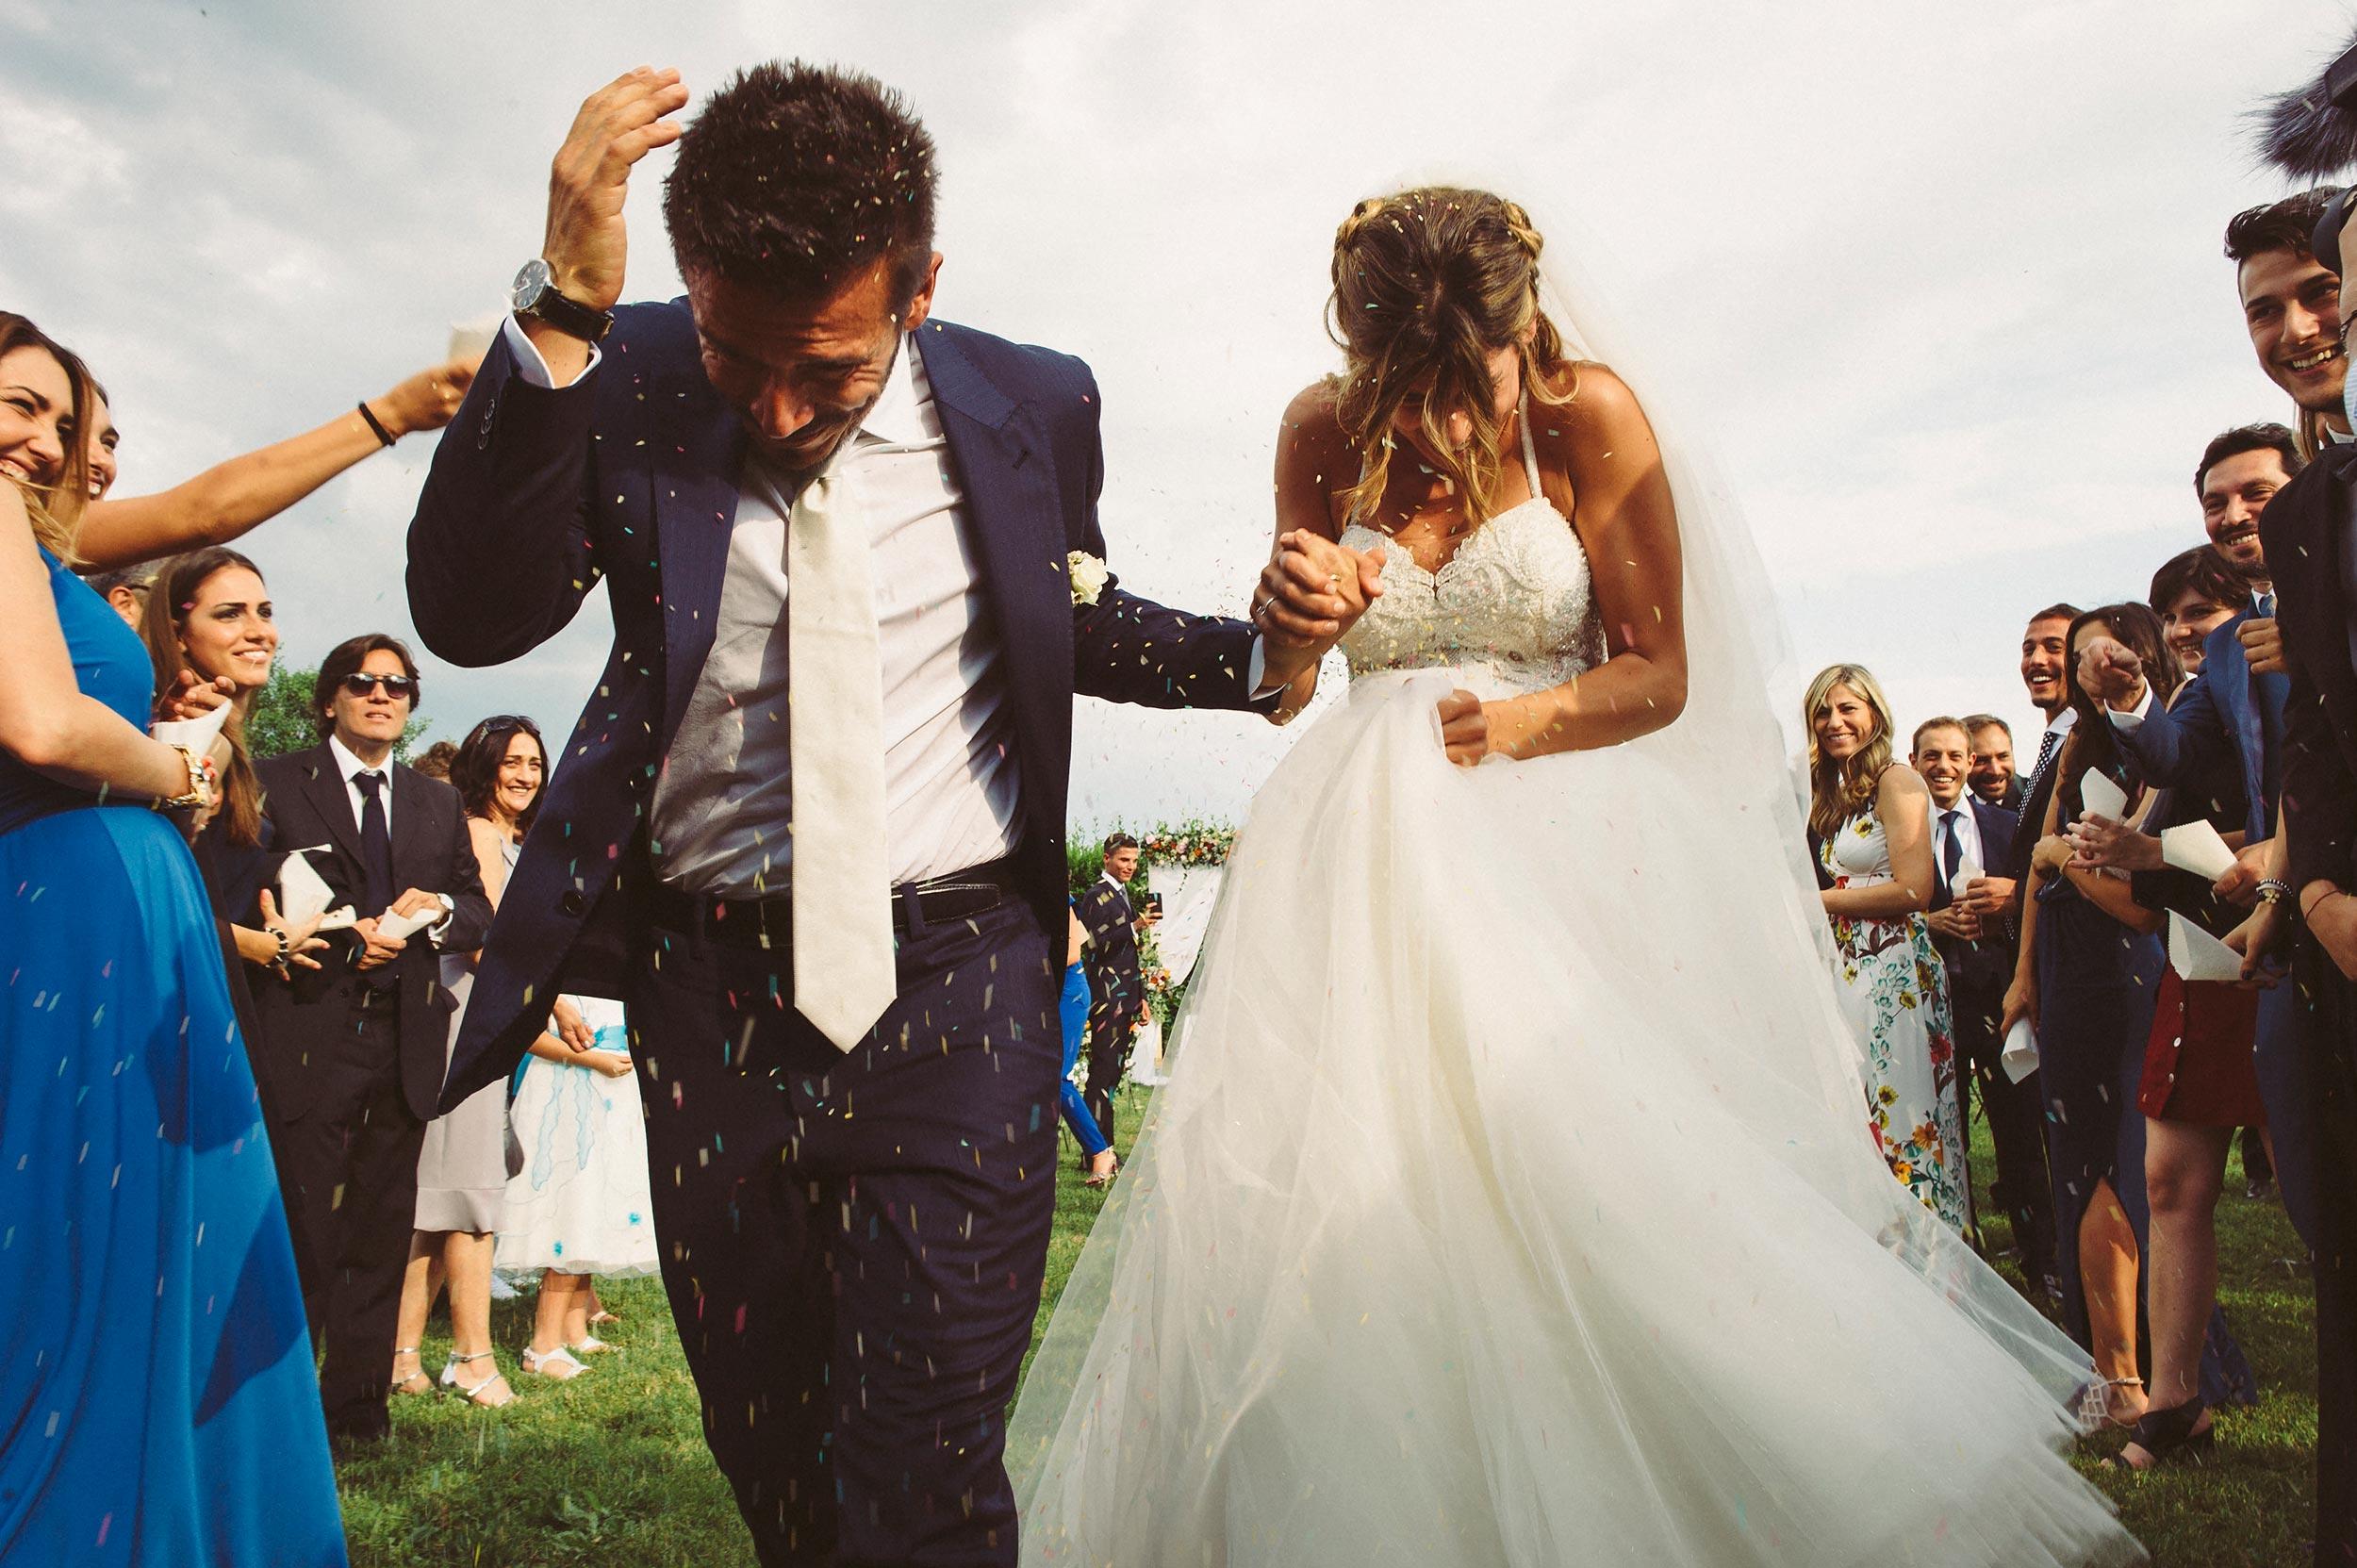 wedding-ceremony-garden-italy-bride-and-groom-running-confetti-rice-documentary-wedding-photography-by-Alessandro-Avenali.jpg